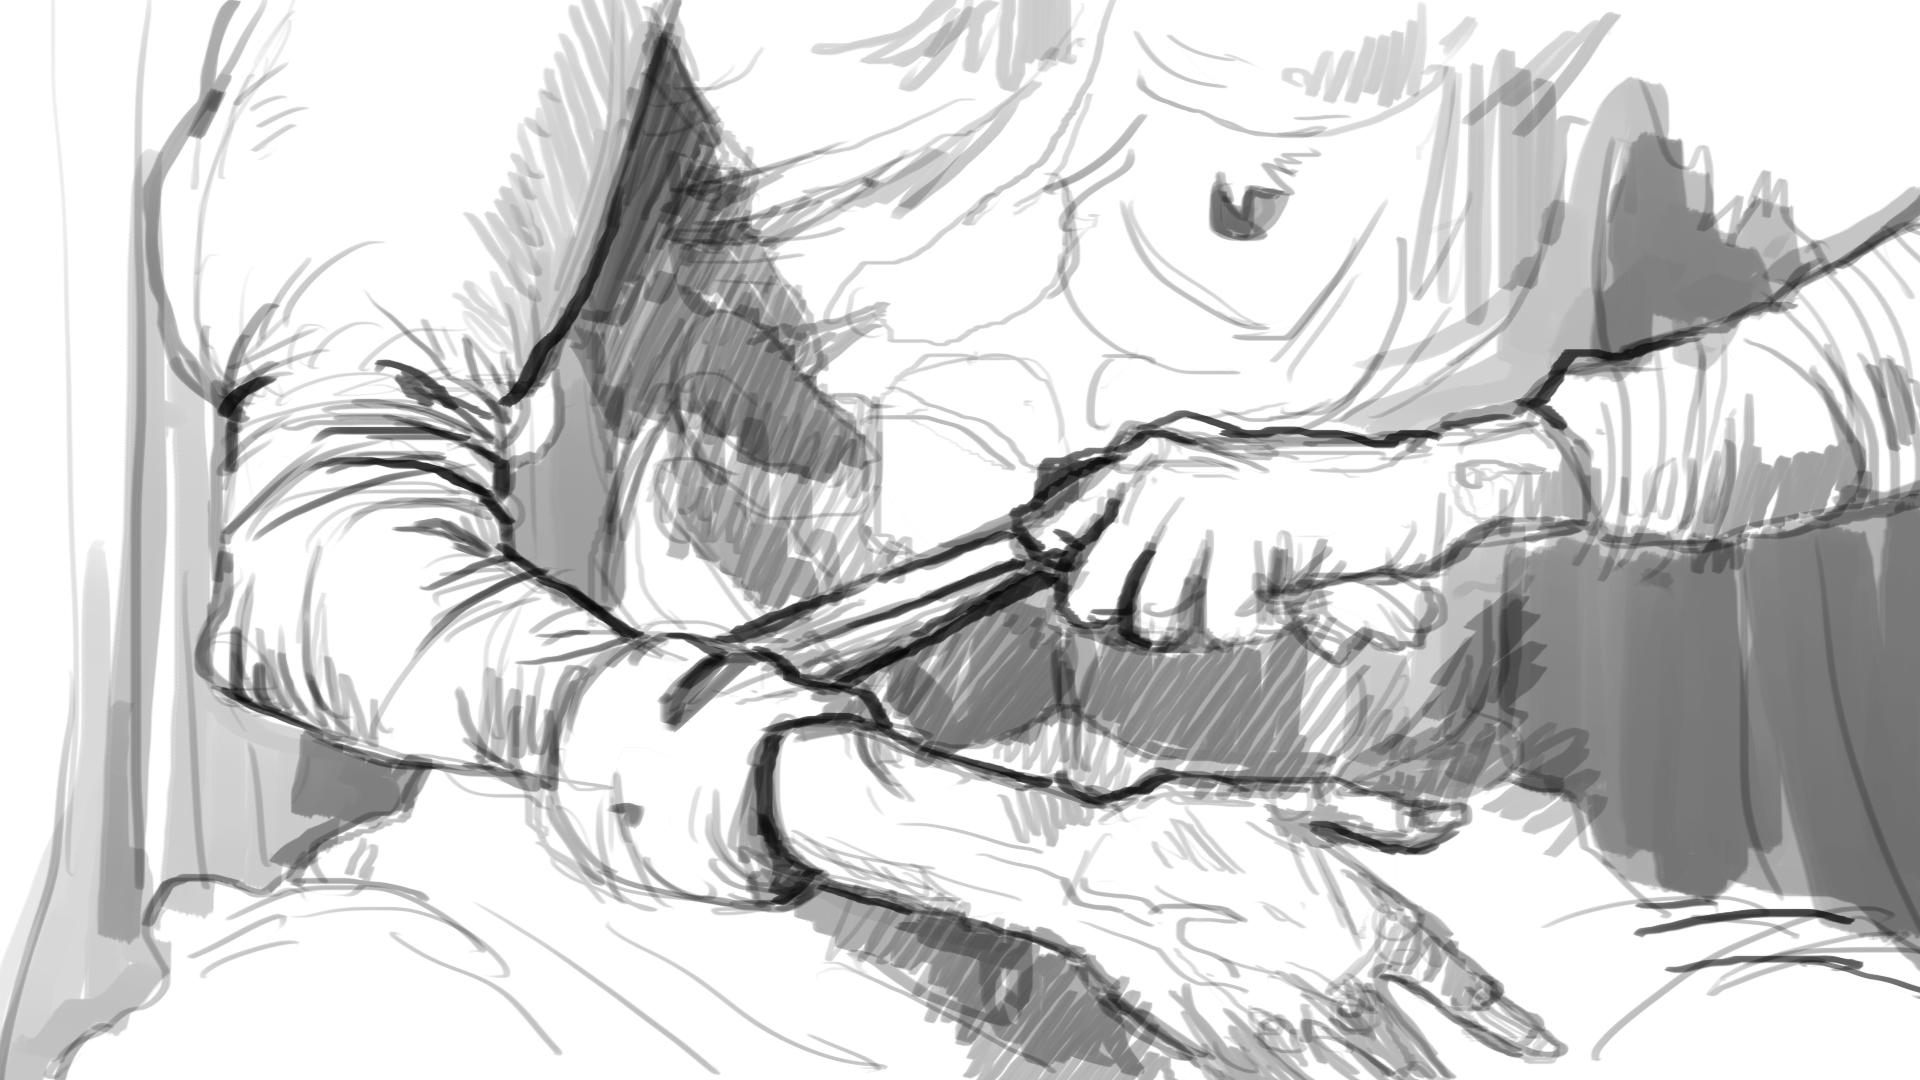 The Kid_Illustration19